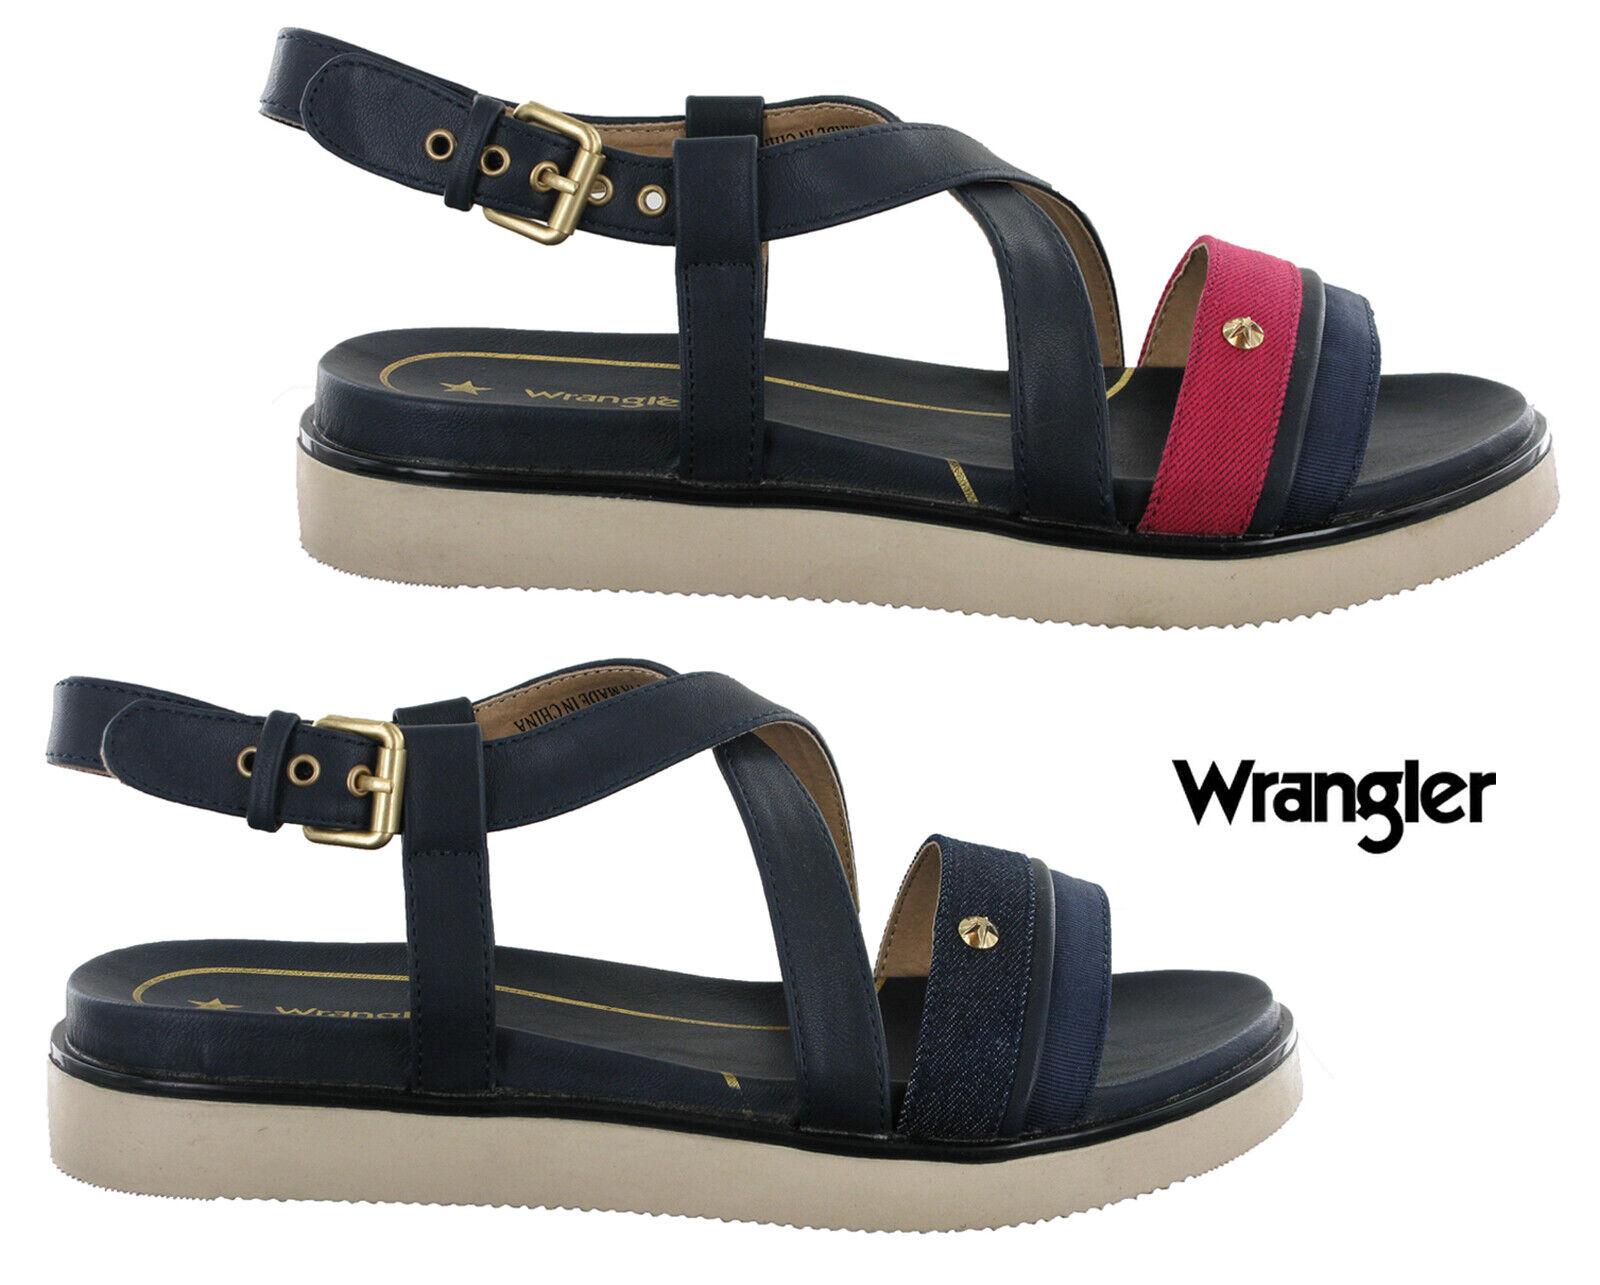 Wrangler Sandales Mode femmes America Karen Sangle Boucle Bout Ouvert chaussures